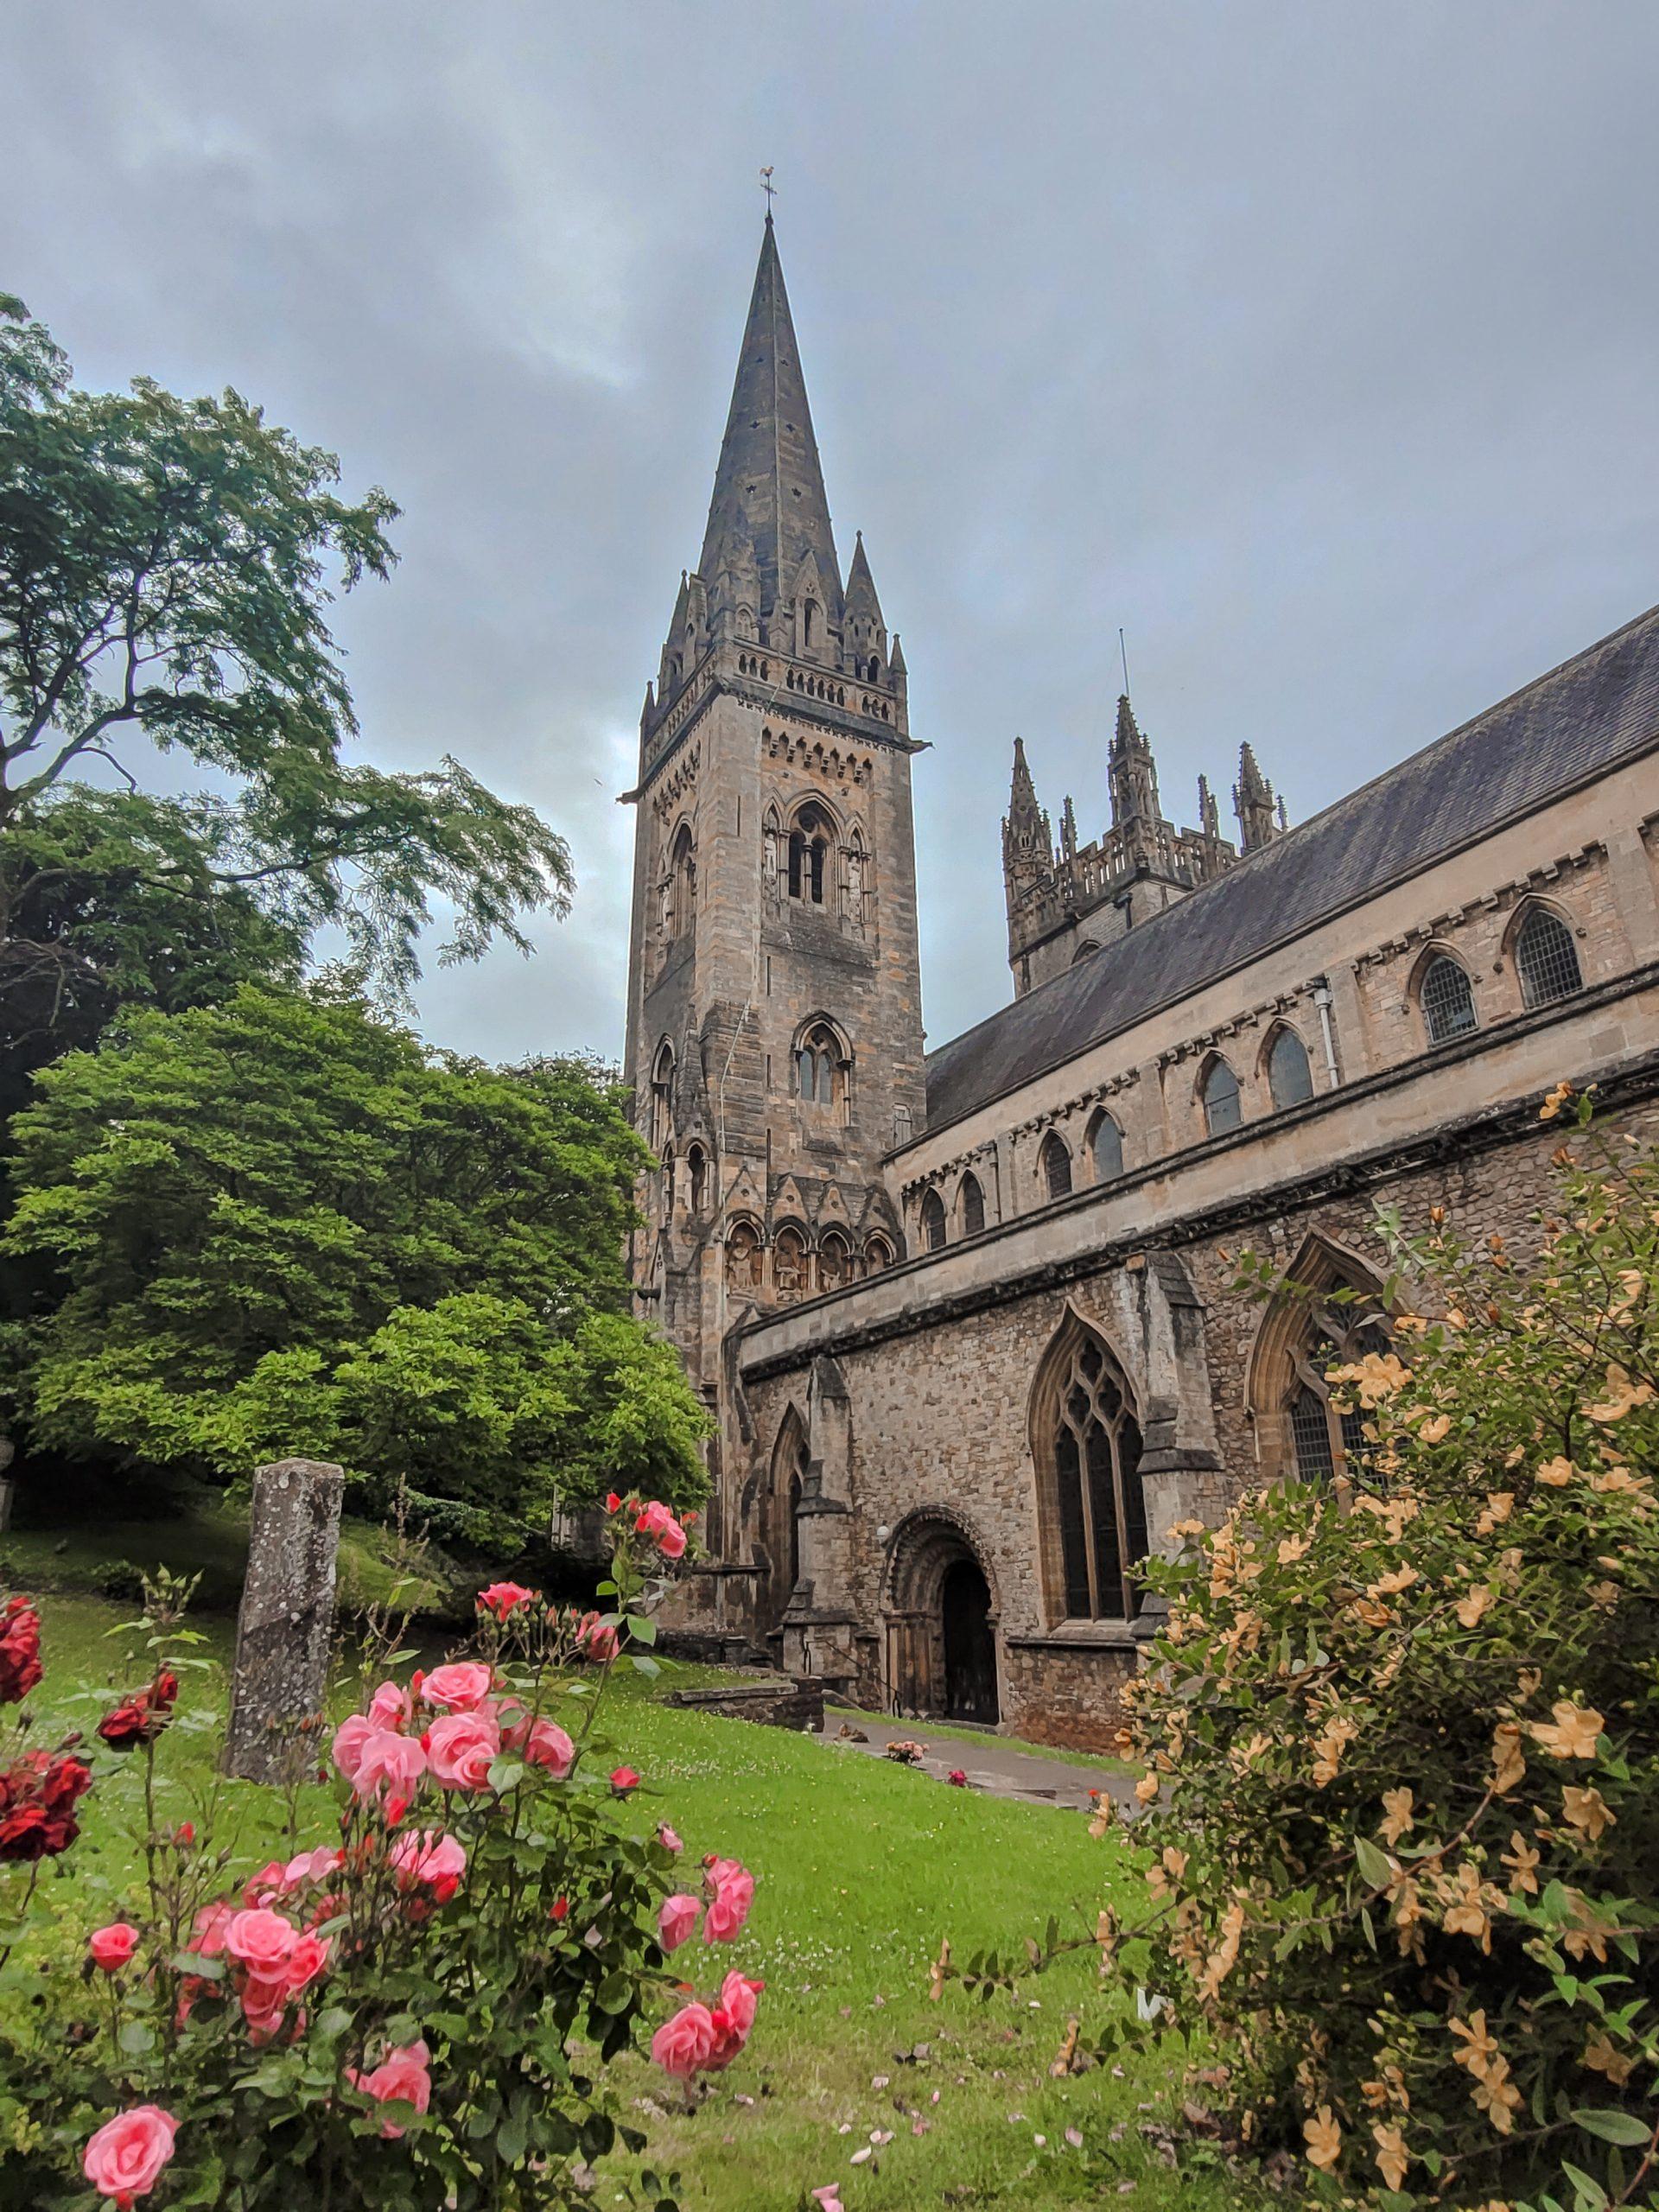 Llandaff Cathedral Exterior